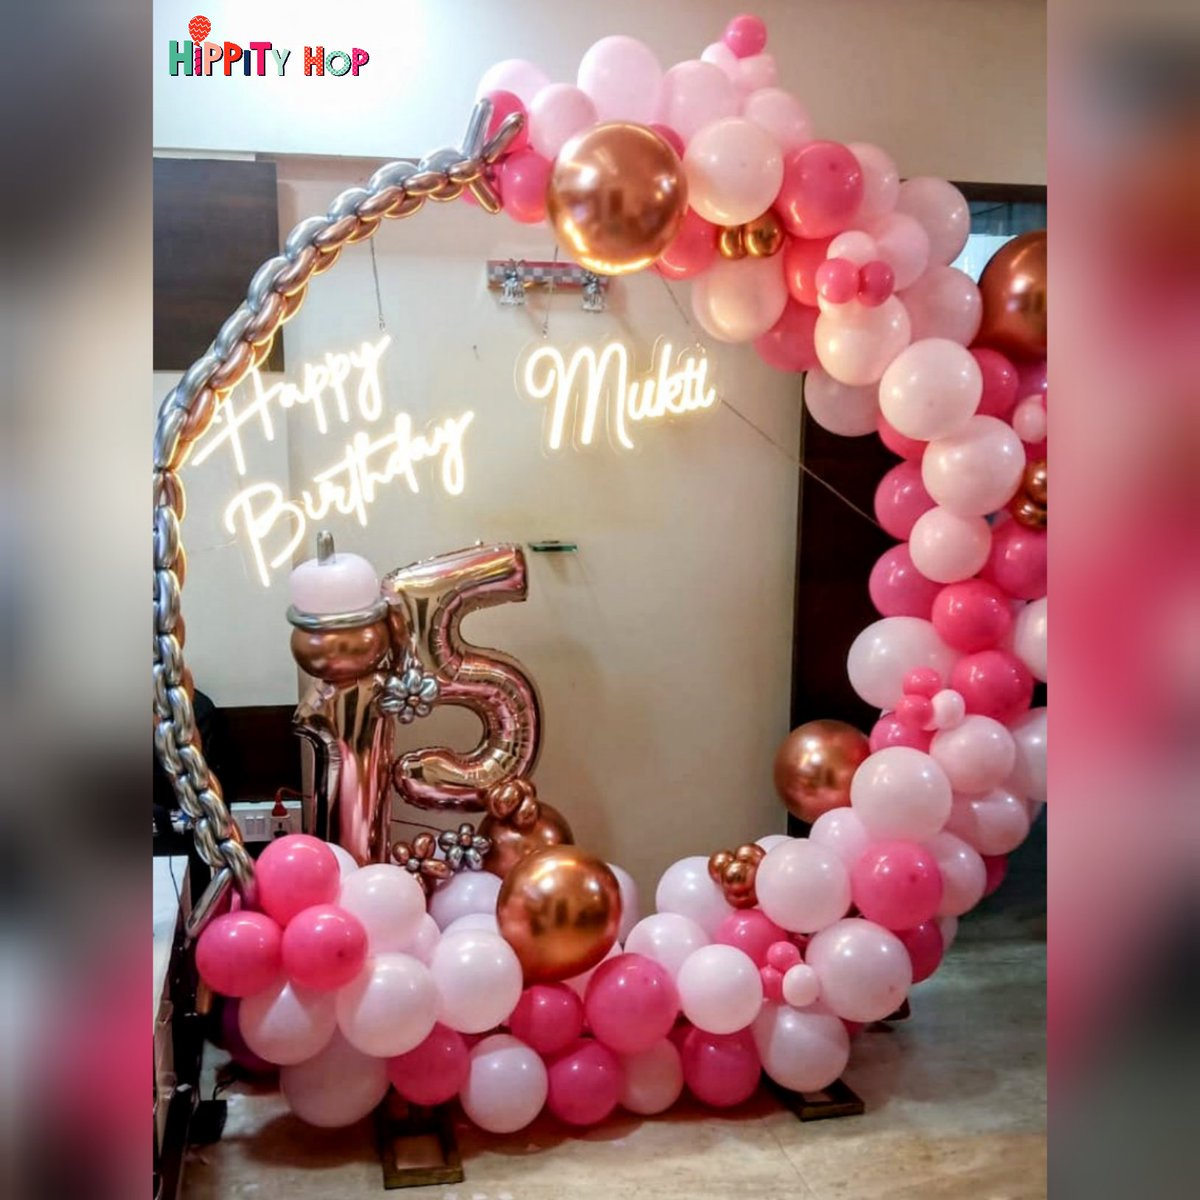 Unforgettable birthday decorations for a stylish party   #hippityhopstore #birthdaypartydecor #birthdaydecorations #partydecorations #pinkdecor #pinkballoons #octoberbirthday #birthdayideas #birthdaysurprises #birthdaymumbai #birthdayparty #birthdayexcitement #funtime